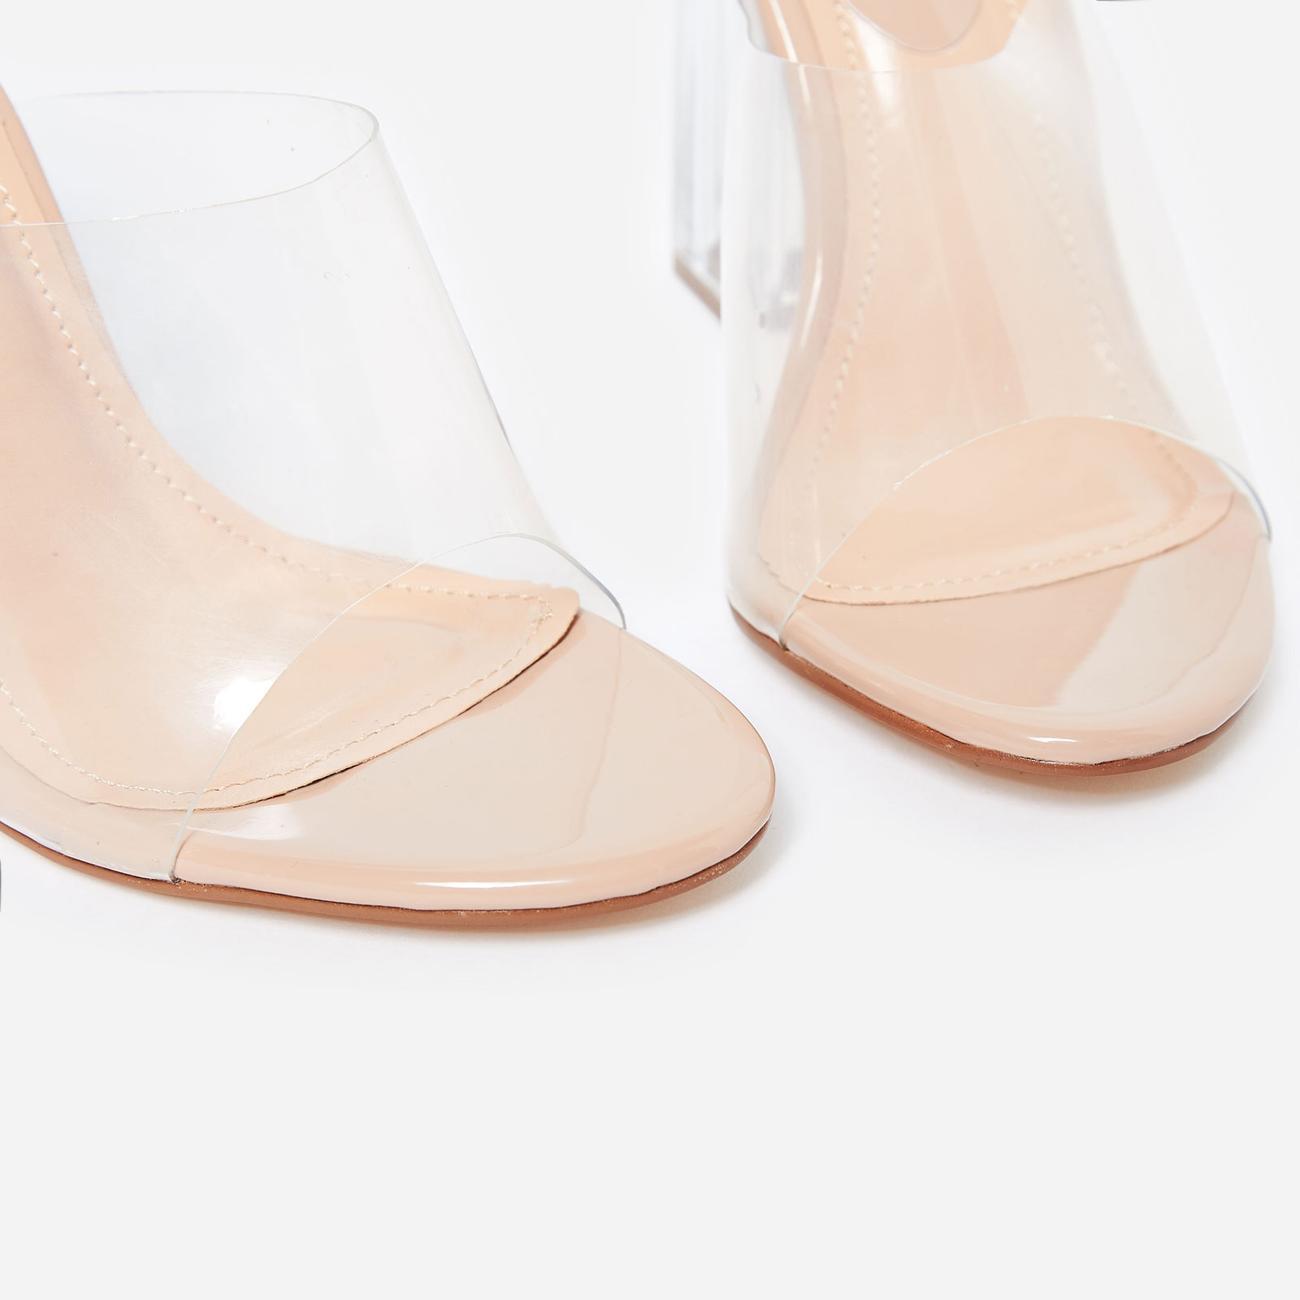 Fusion Peep Toe Perspex Block Clear Heel Mule In Nude Patent Image 4